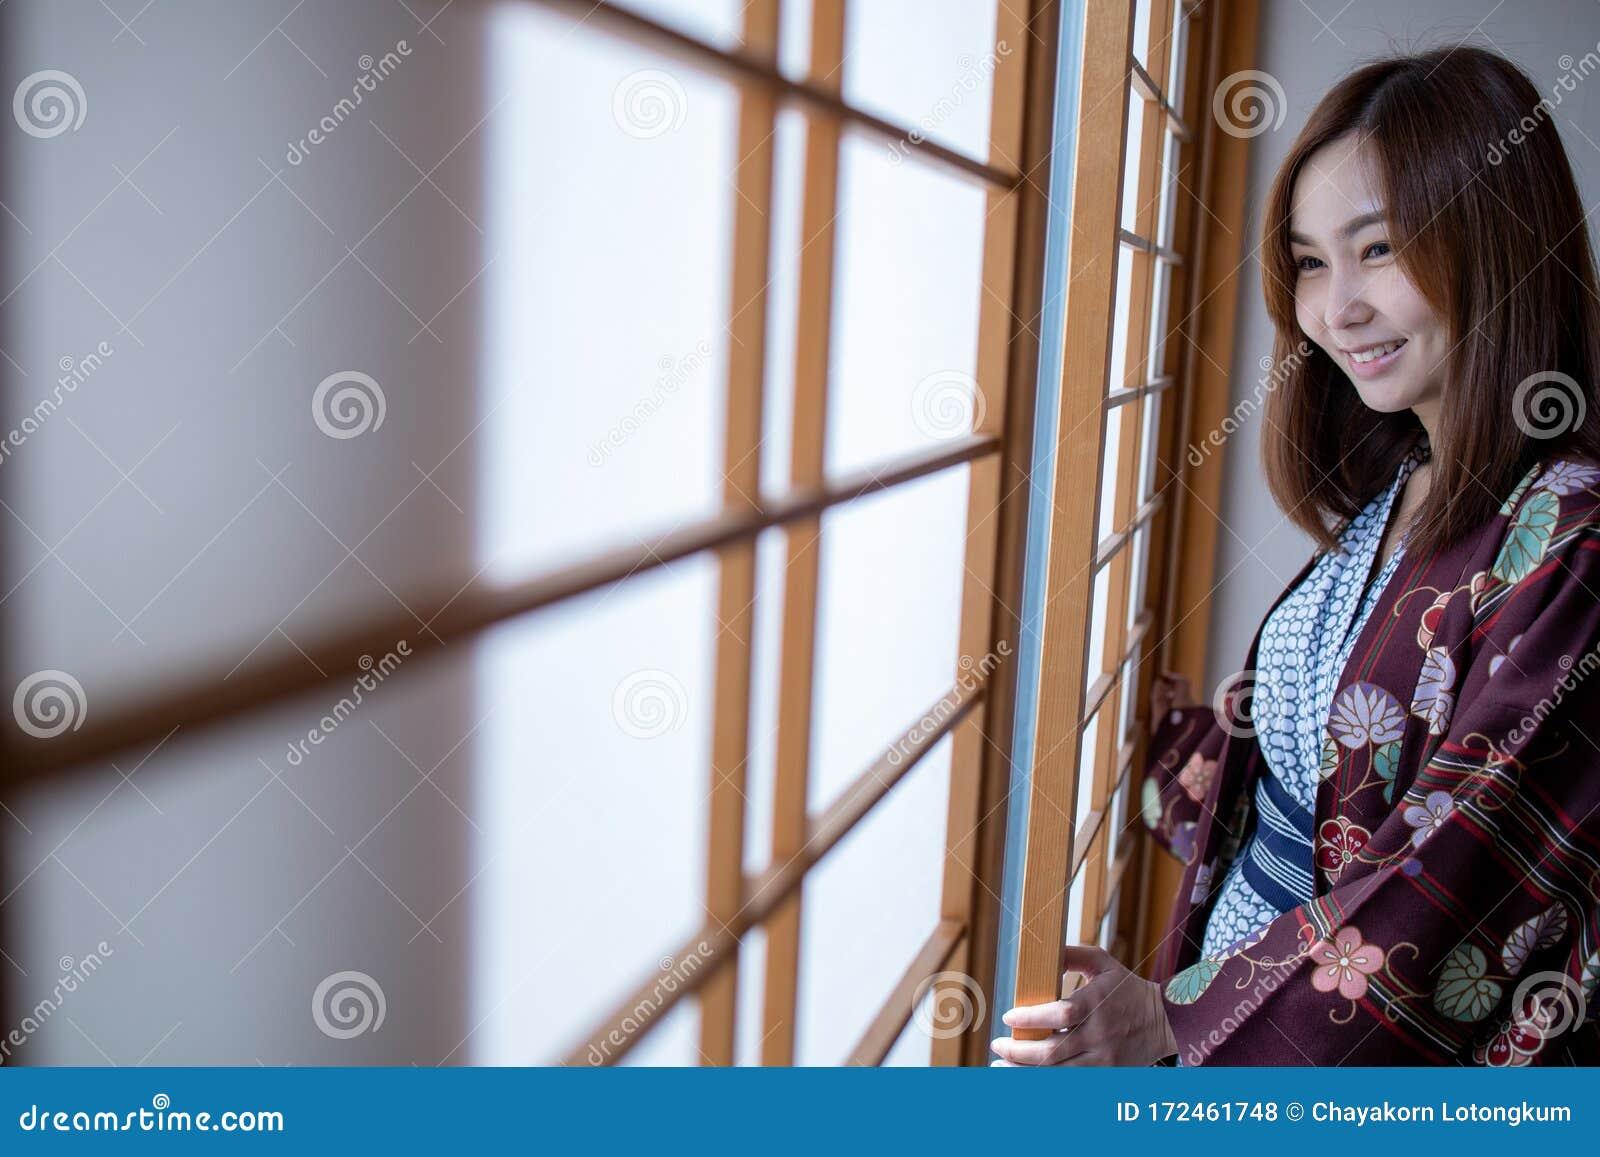 Asian girl wearung tampon gallery